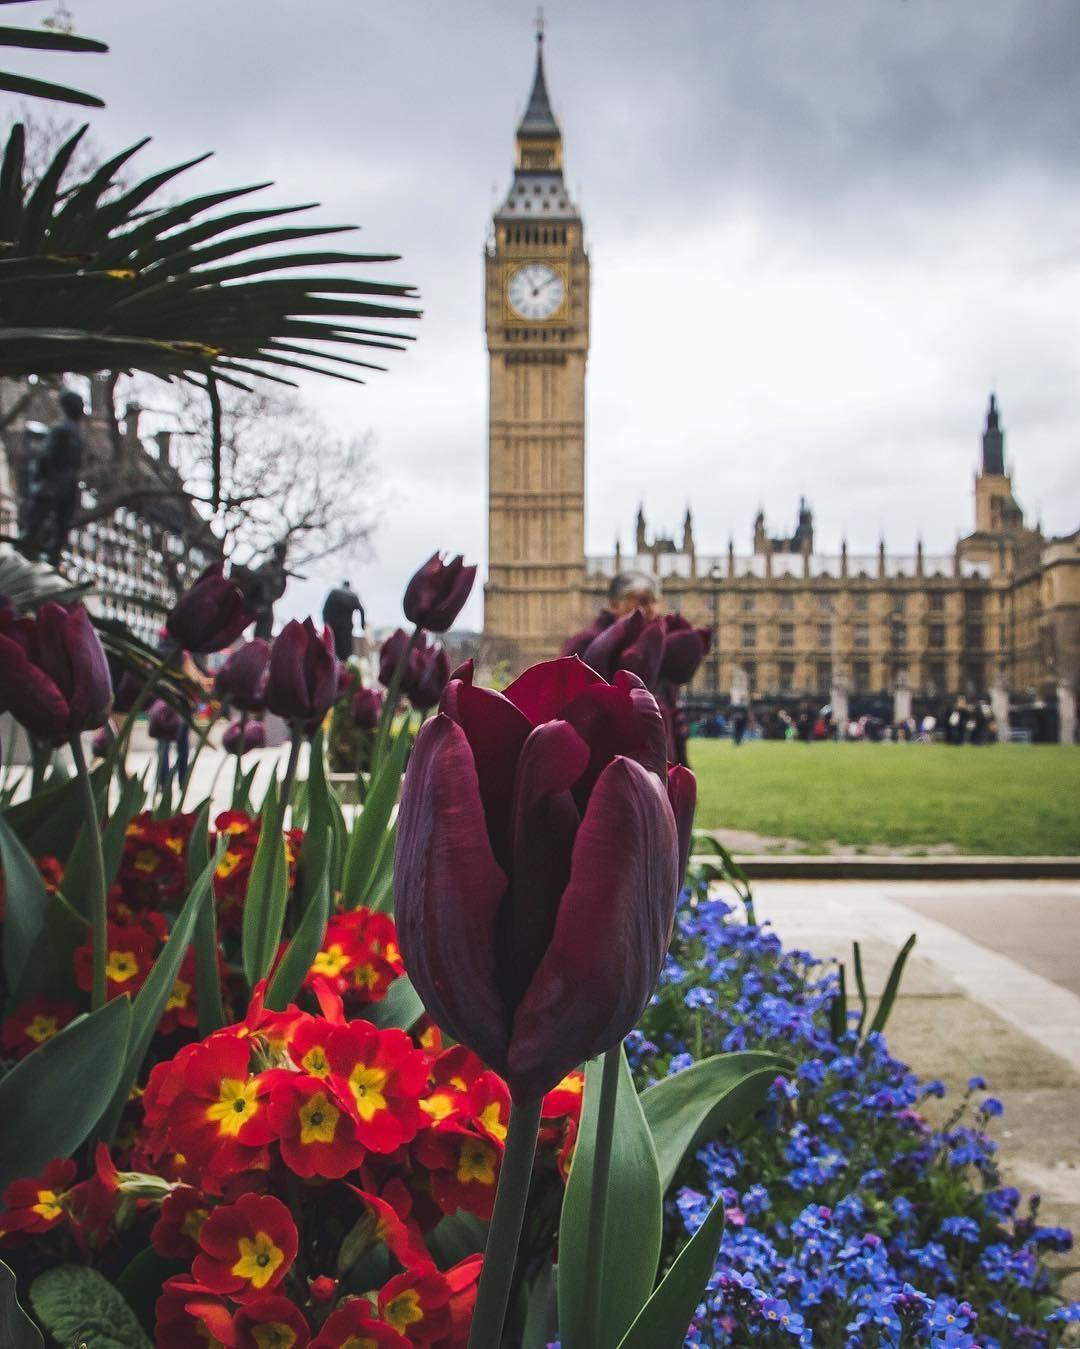 Floral Ben  #urbanphotography  #mycanon #canon  #londonwide #cityofcities #citypicz  #igerslondon  #lovegreatbritain #shutup_london #stelleruk #super_holland #thisislondon #timeoutlondon #huffpostgram #ink361_europe #liveauthentic #livefolk #passionpassport #streetdreamsmag #toplondonphoto #visitlondon #LDNstreets by mumhad1ofthose